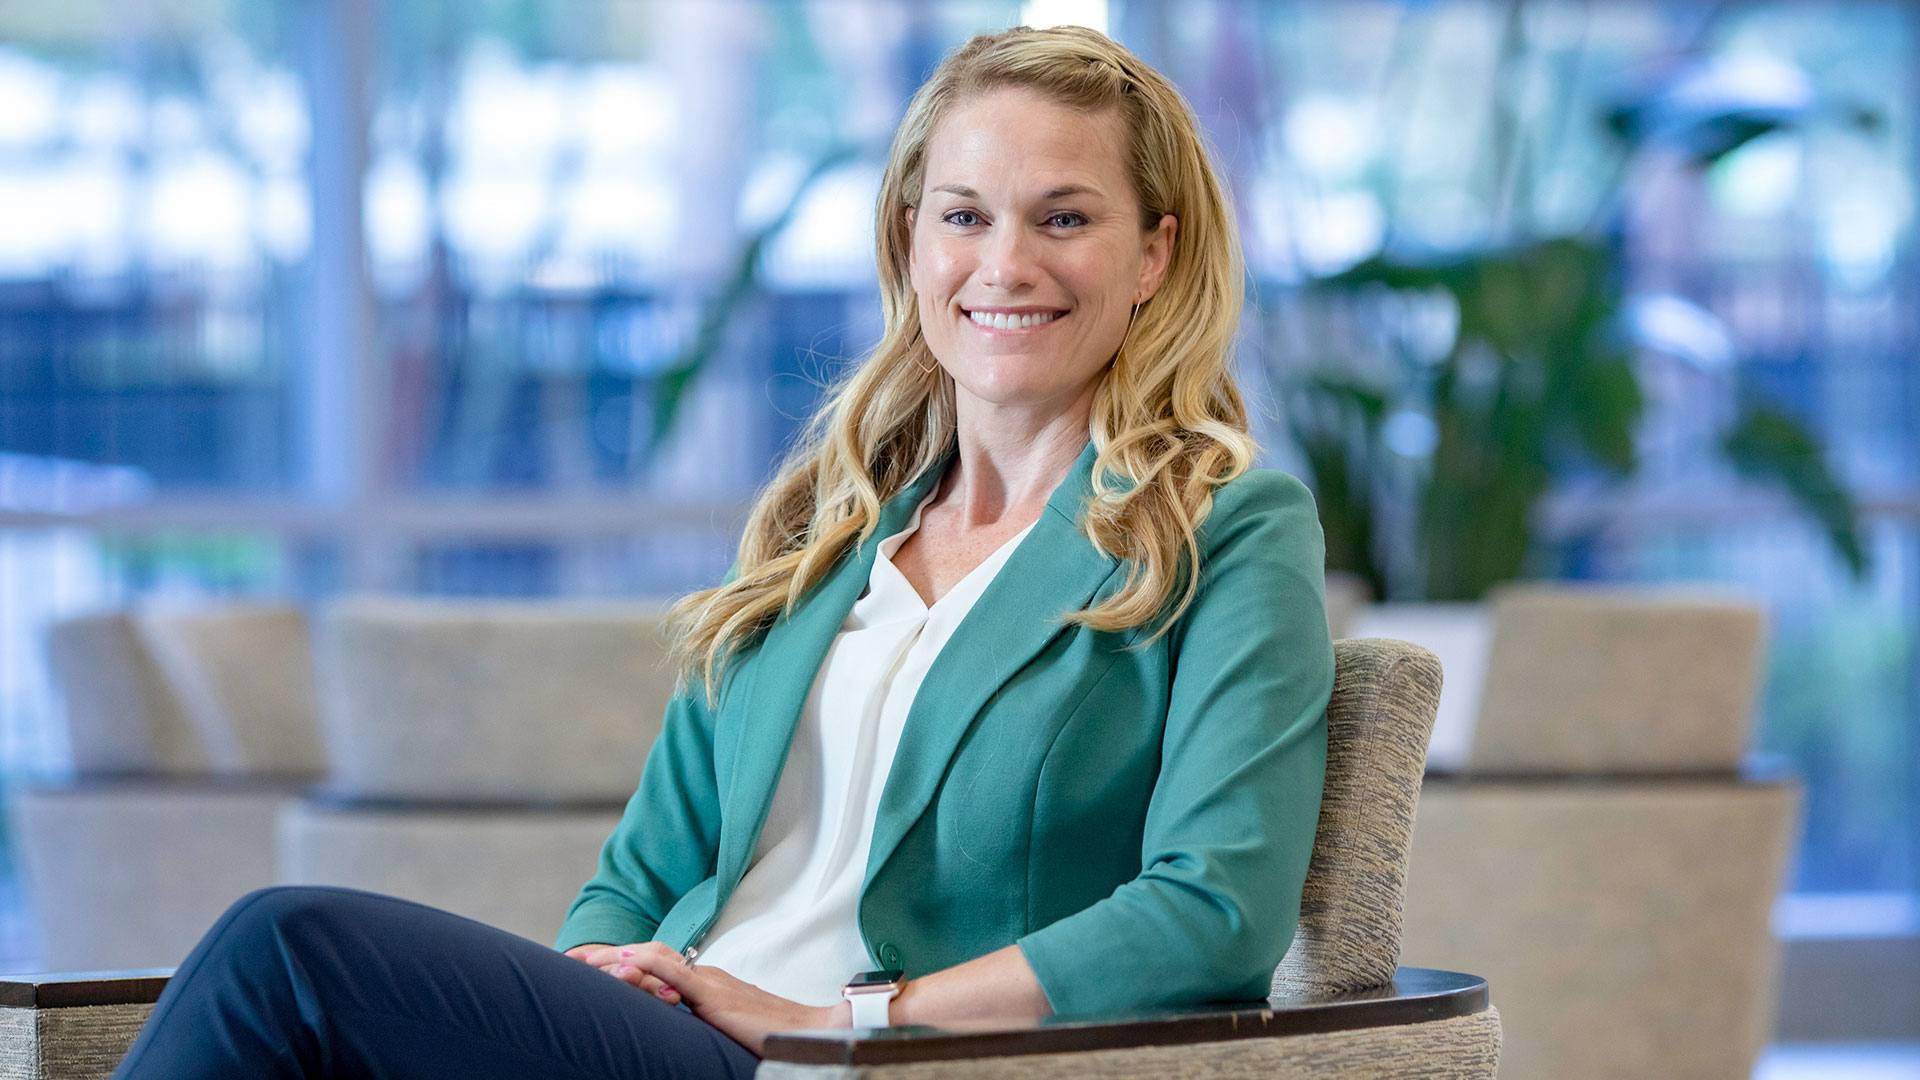 Hometown Spirit — Jennifer Quilty, DNP, APRN, Chief Clinical Officer, Orlando Health Medical Group